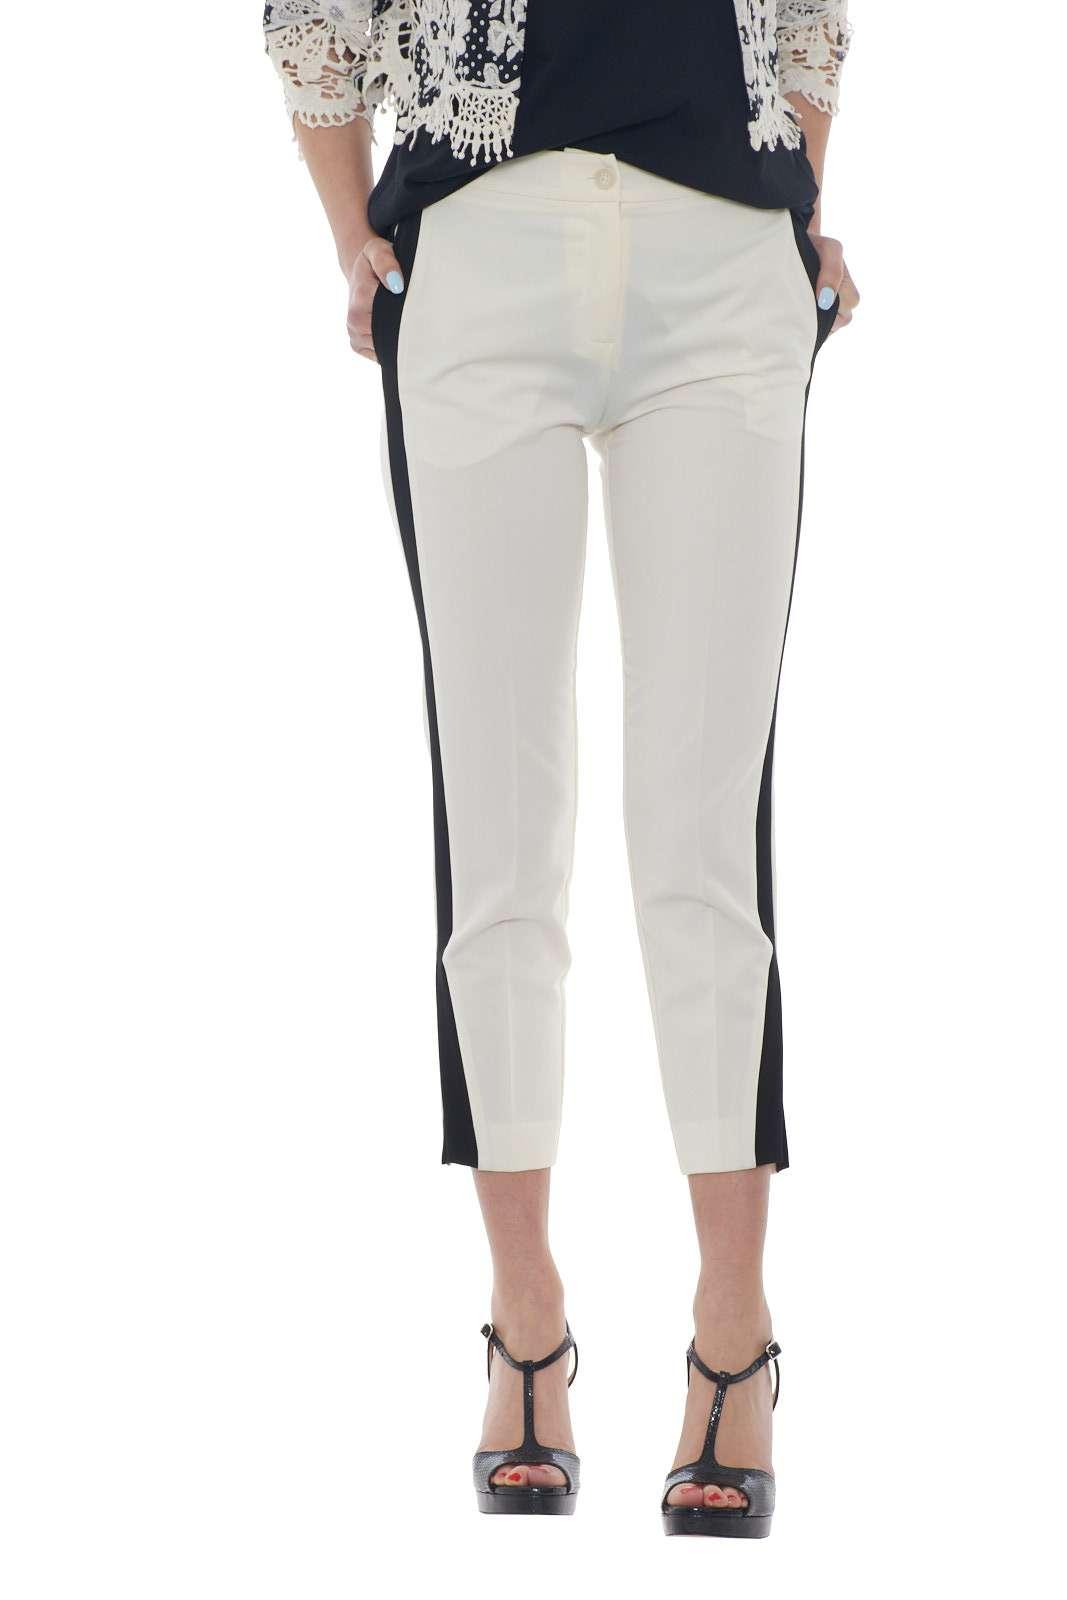 https://www.parmax.com/media/catalog/product/a/i/PE-outlet_parmax-pantaloni-donna-Ekl%C3%A8-1015827-A.jpg